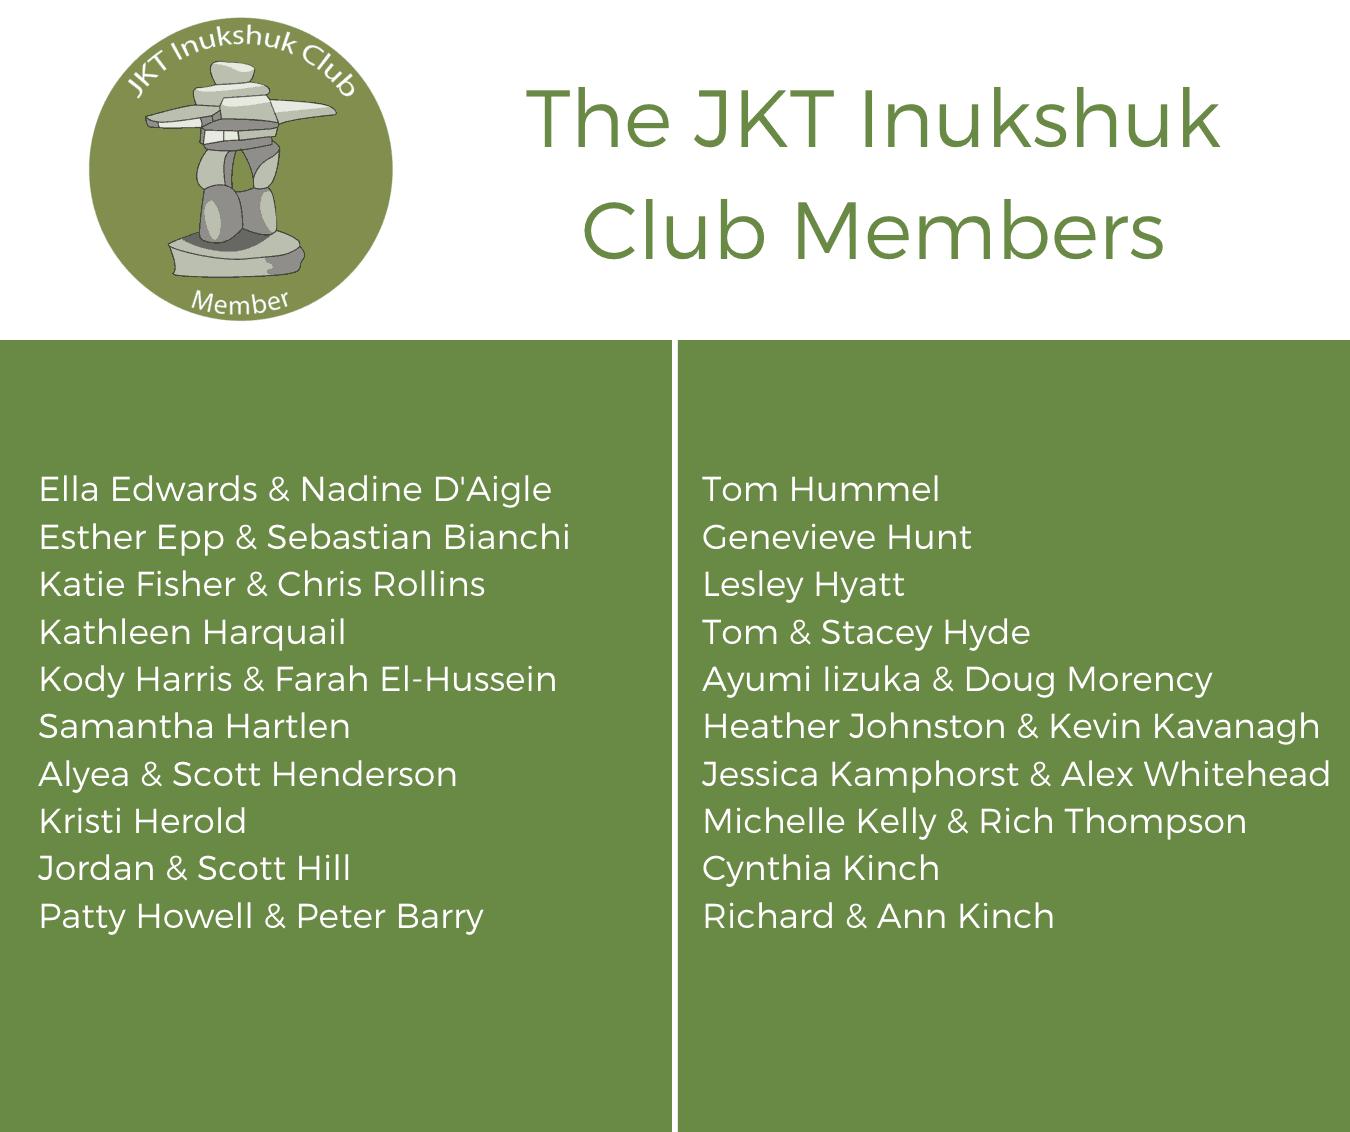 jkt-inukshuk-club